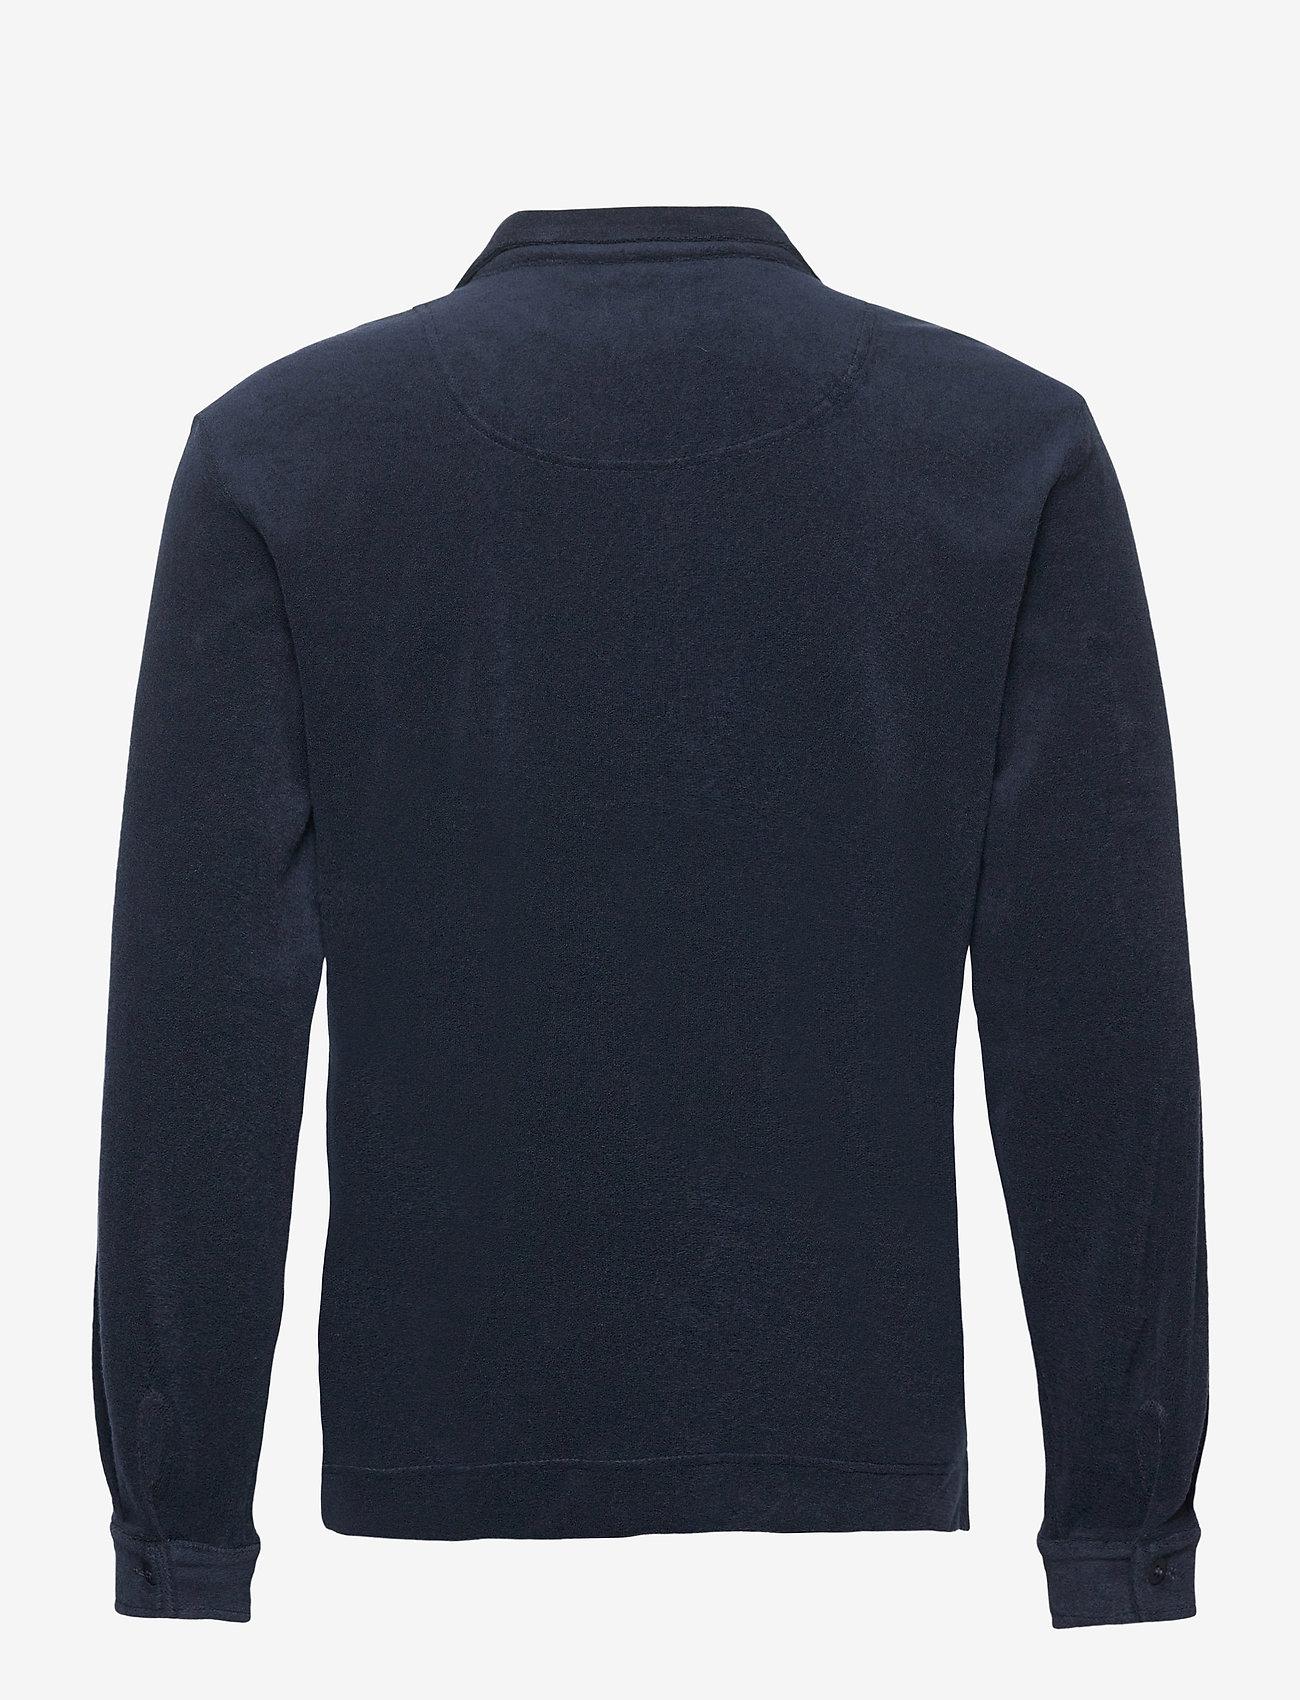 OAS - Navy Terry Camisa - casual overhemden - blue - 1